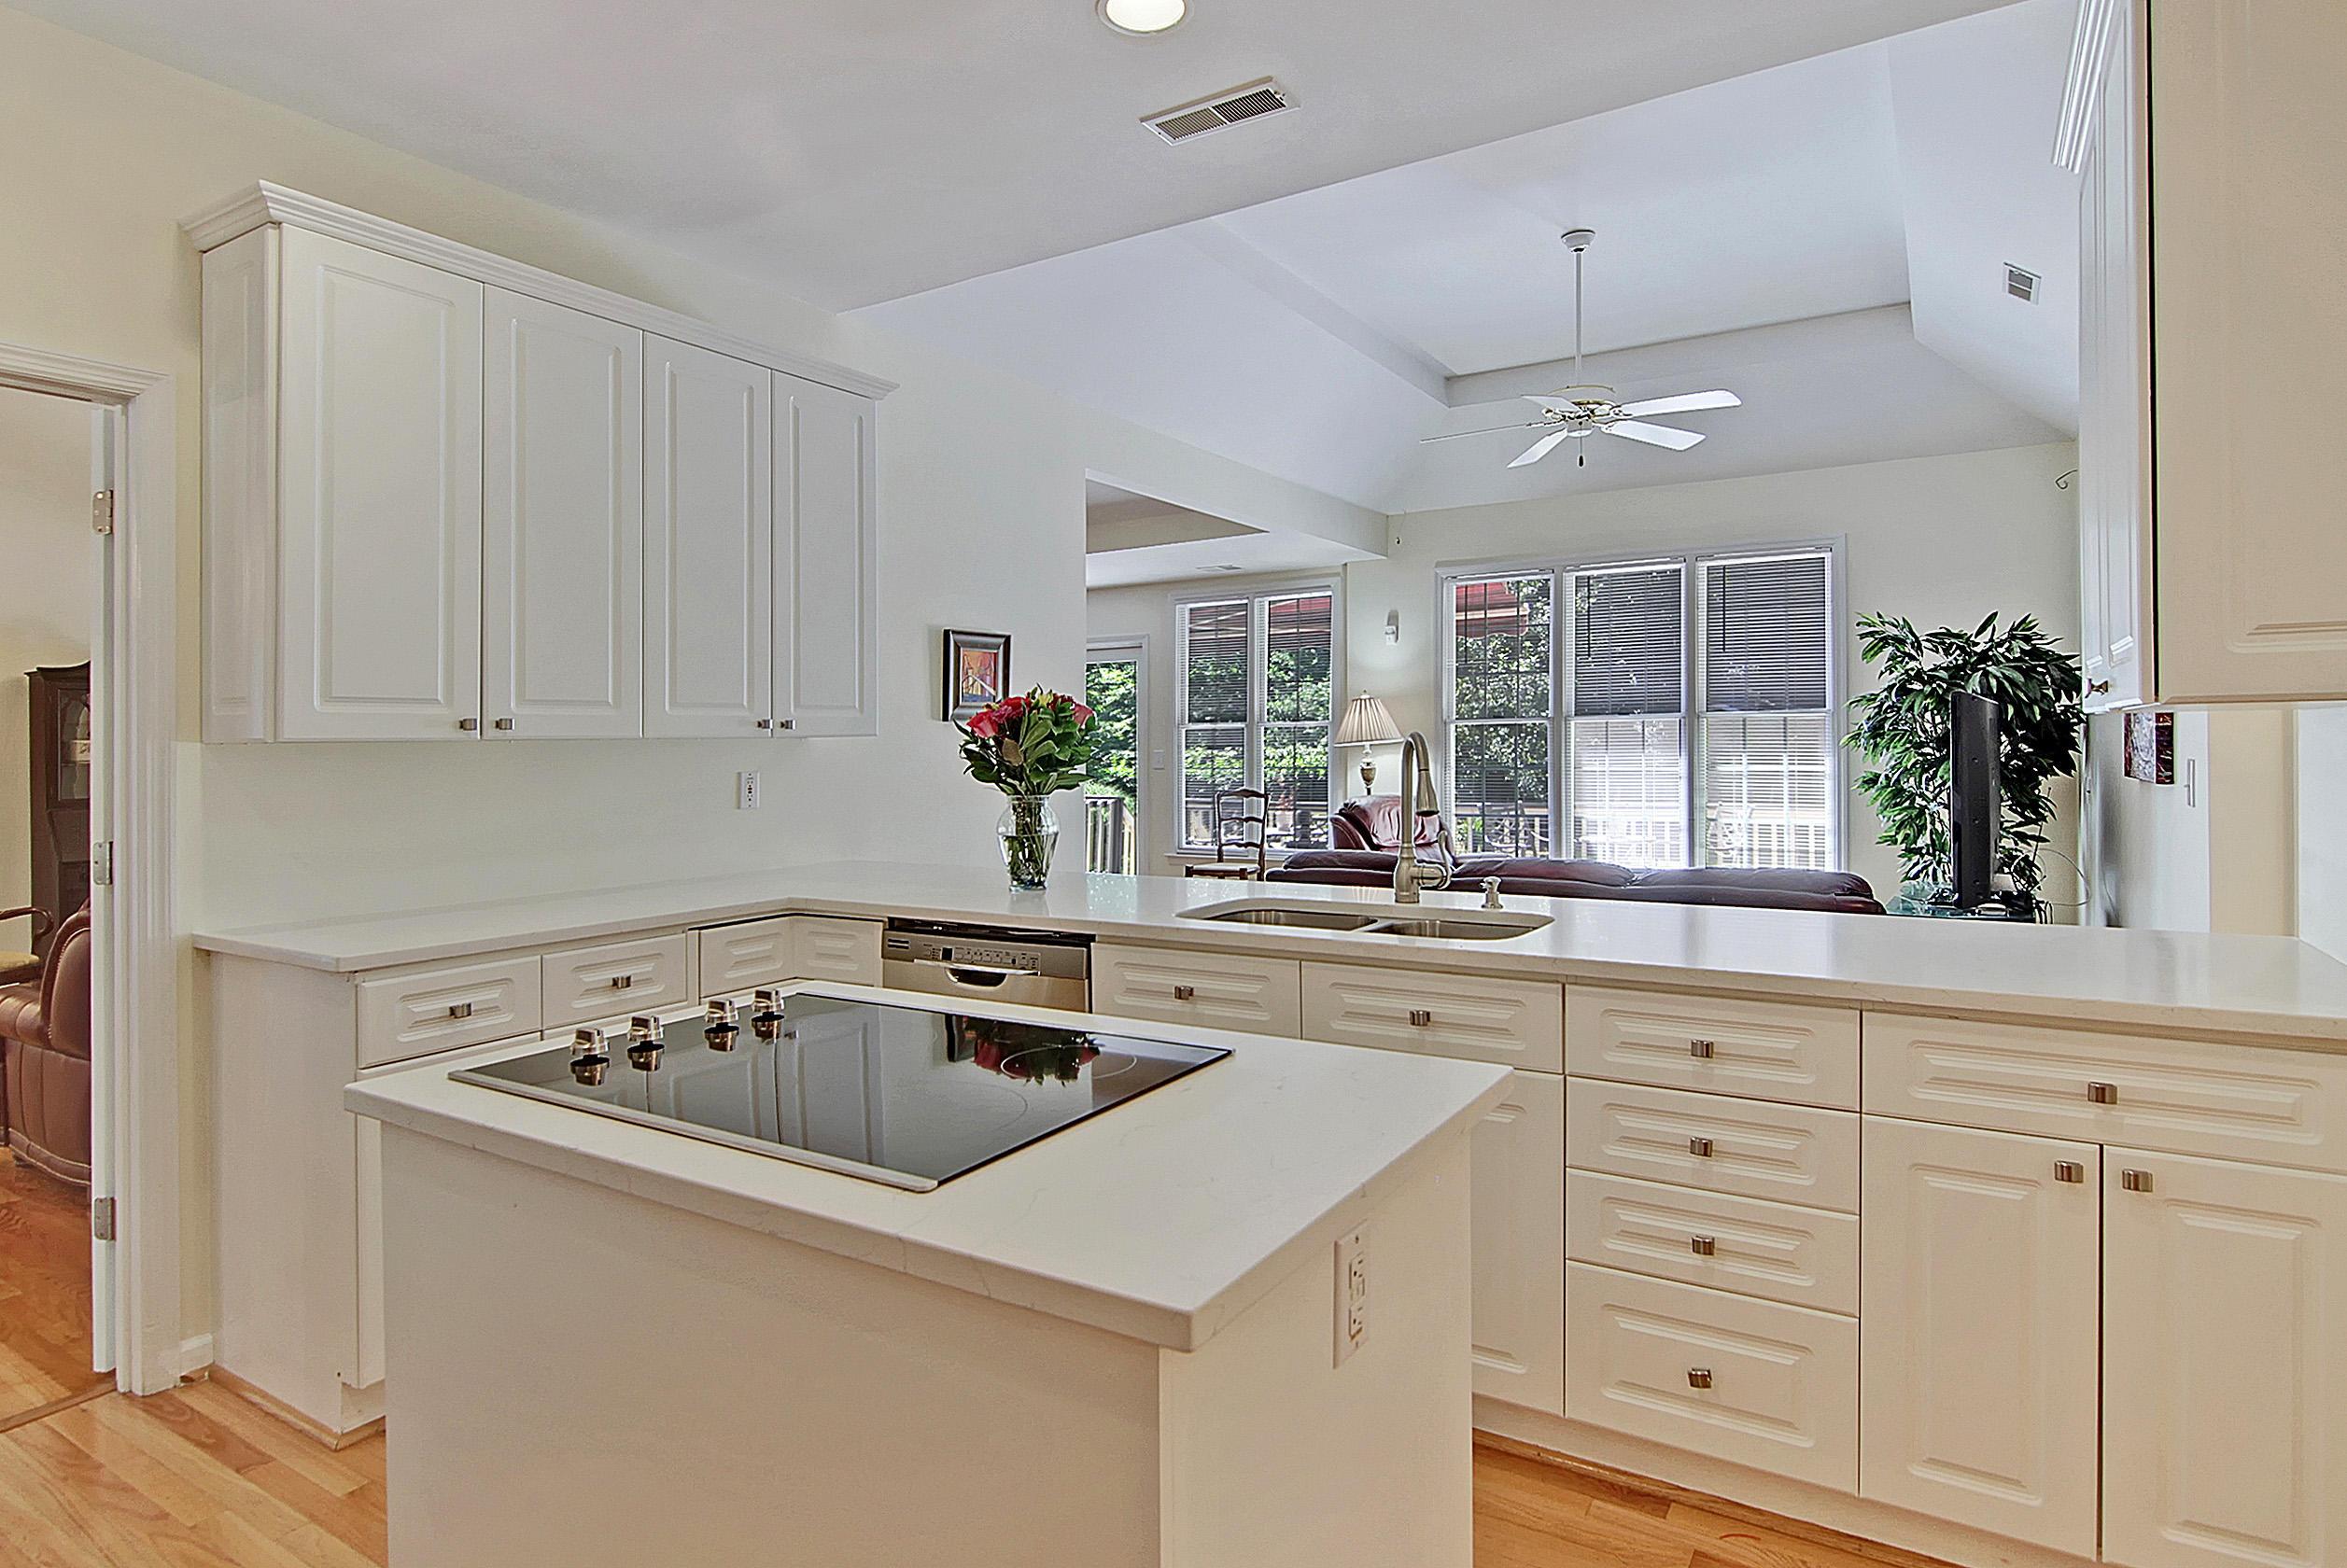 Snee Farm Homes For Sale - 1157 Shilling, Mount Pleasant, SC - 36